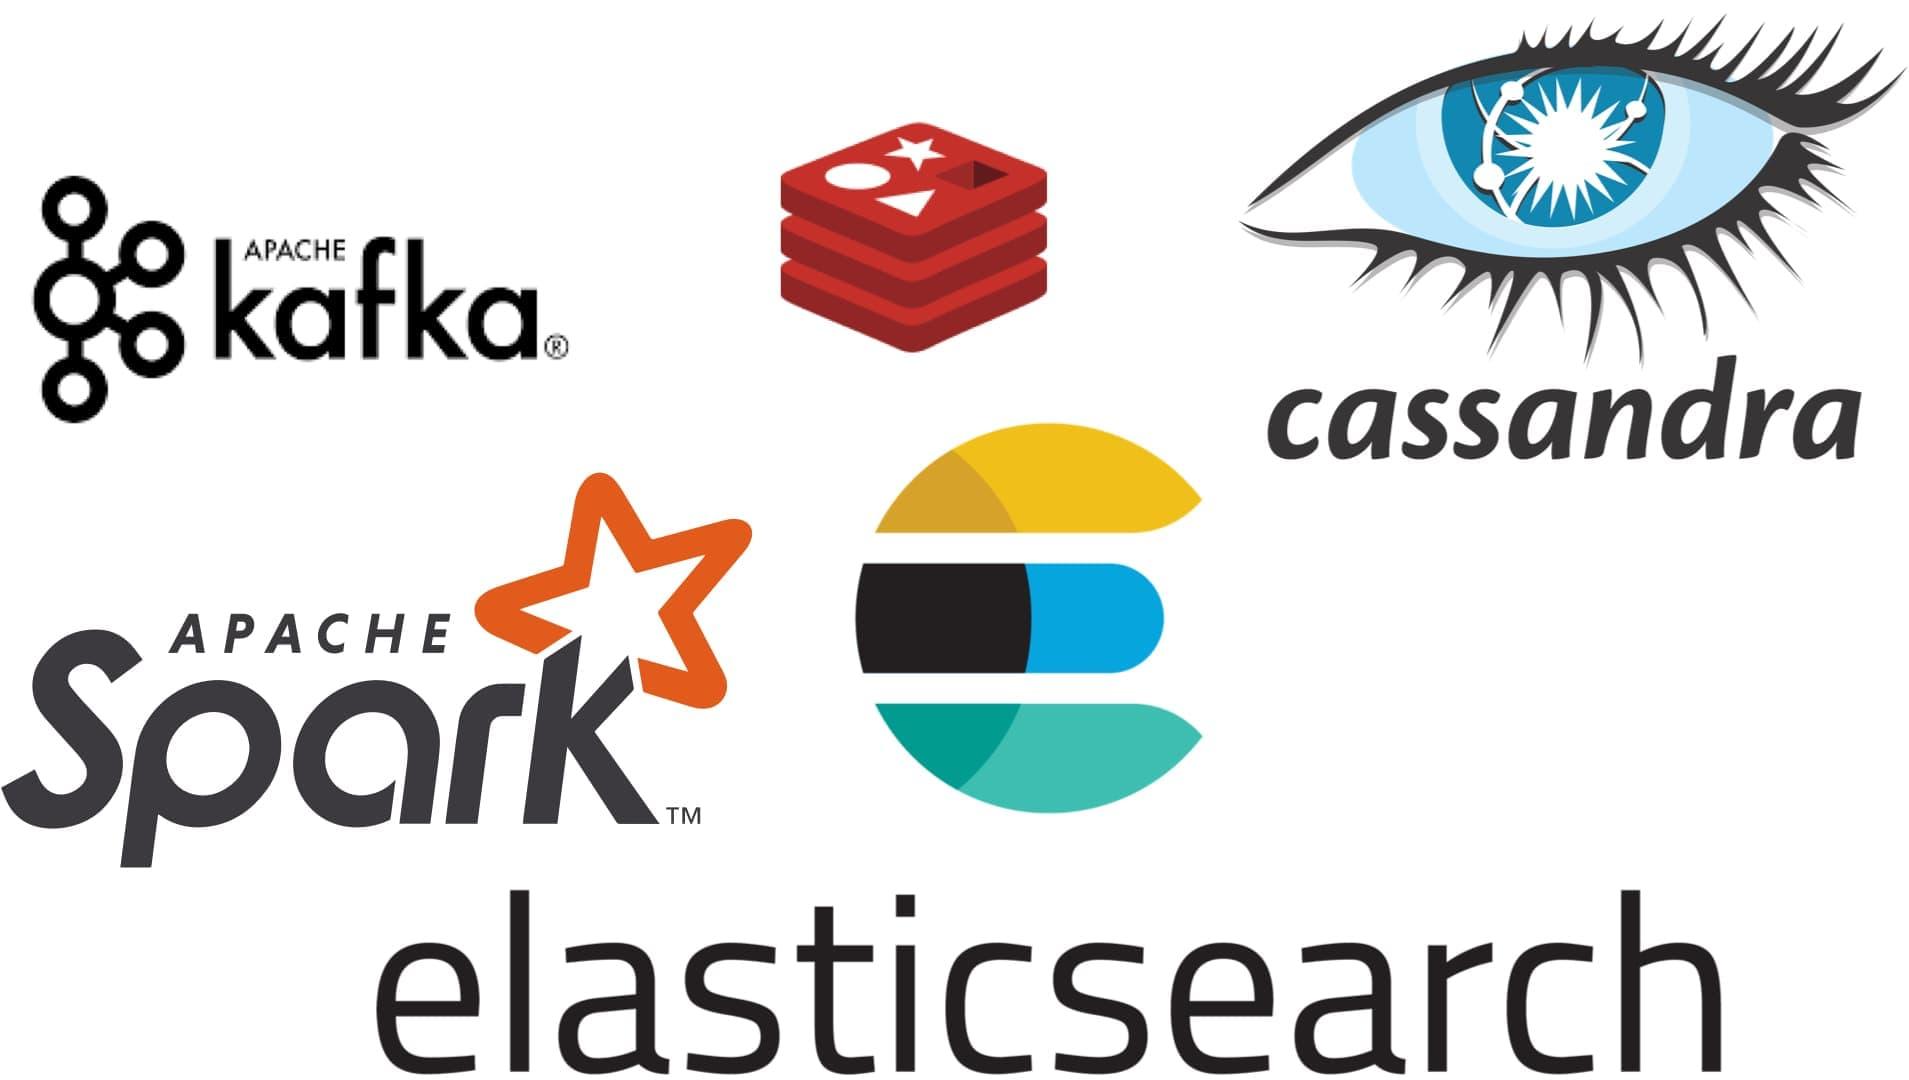 Apache Cassandra, Apache Spark, Apache Kafka, Redis and Elasticsearch